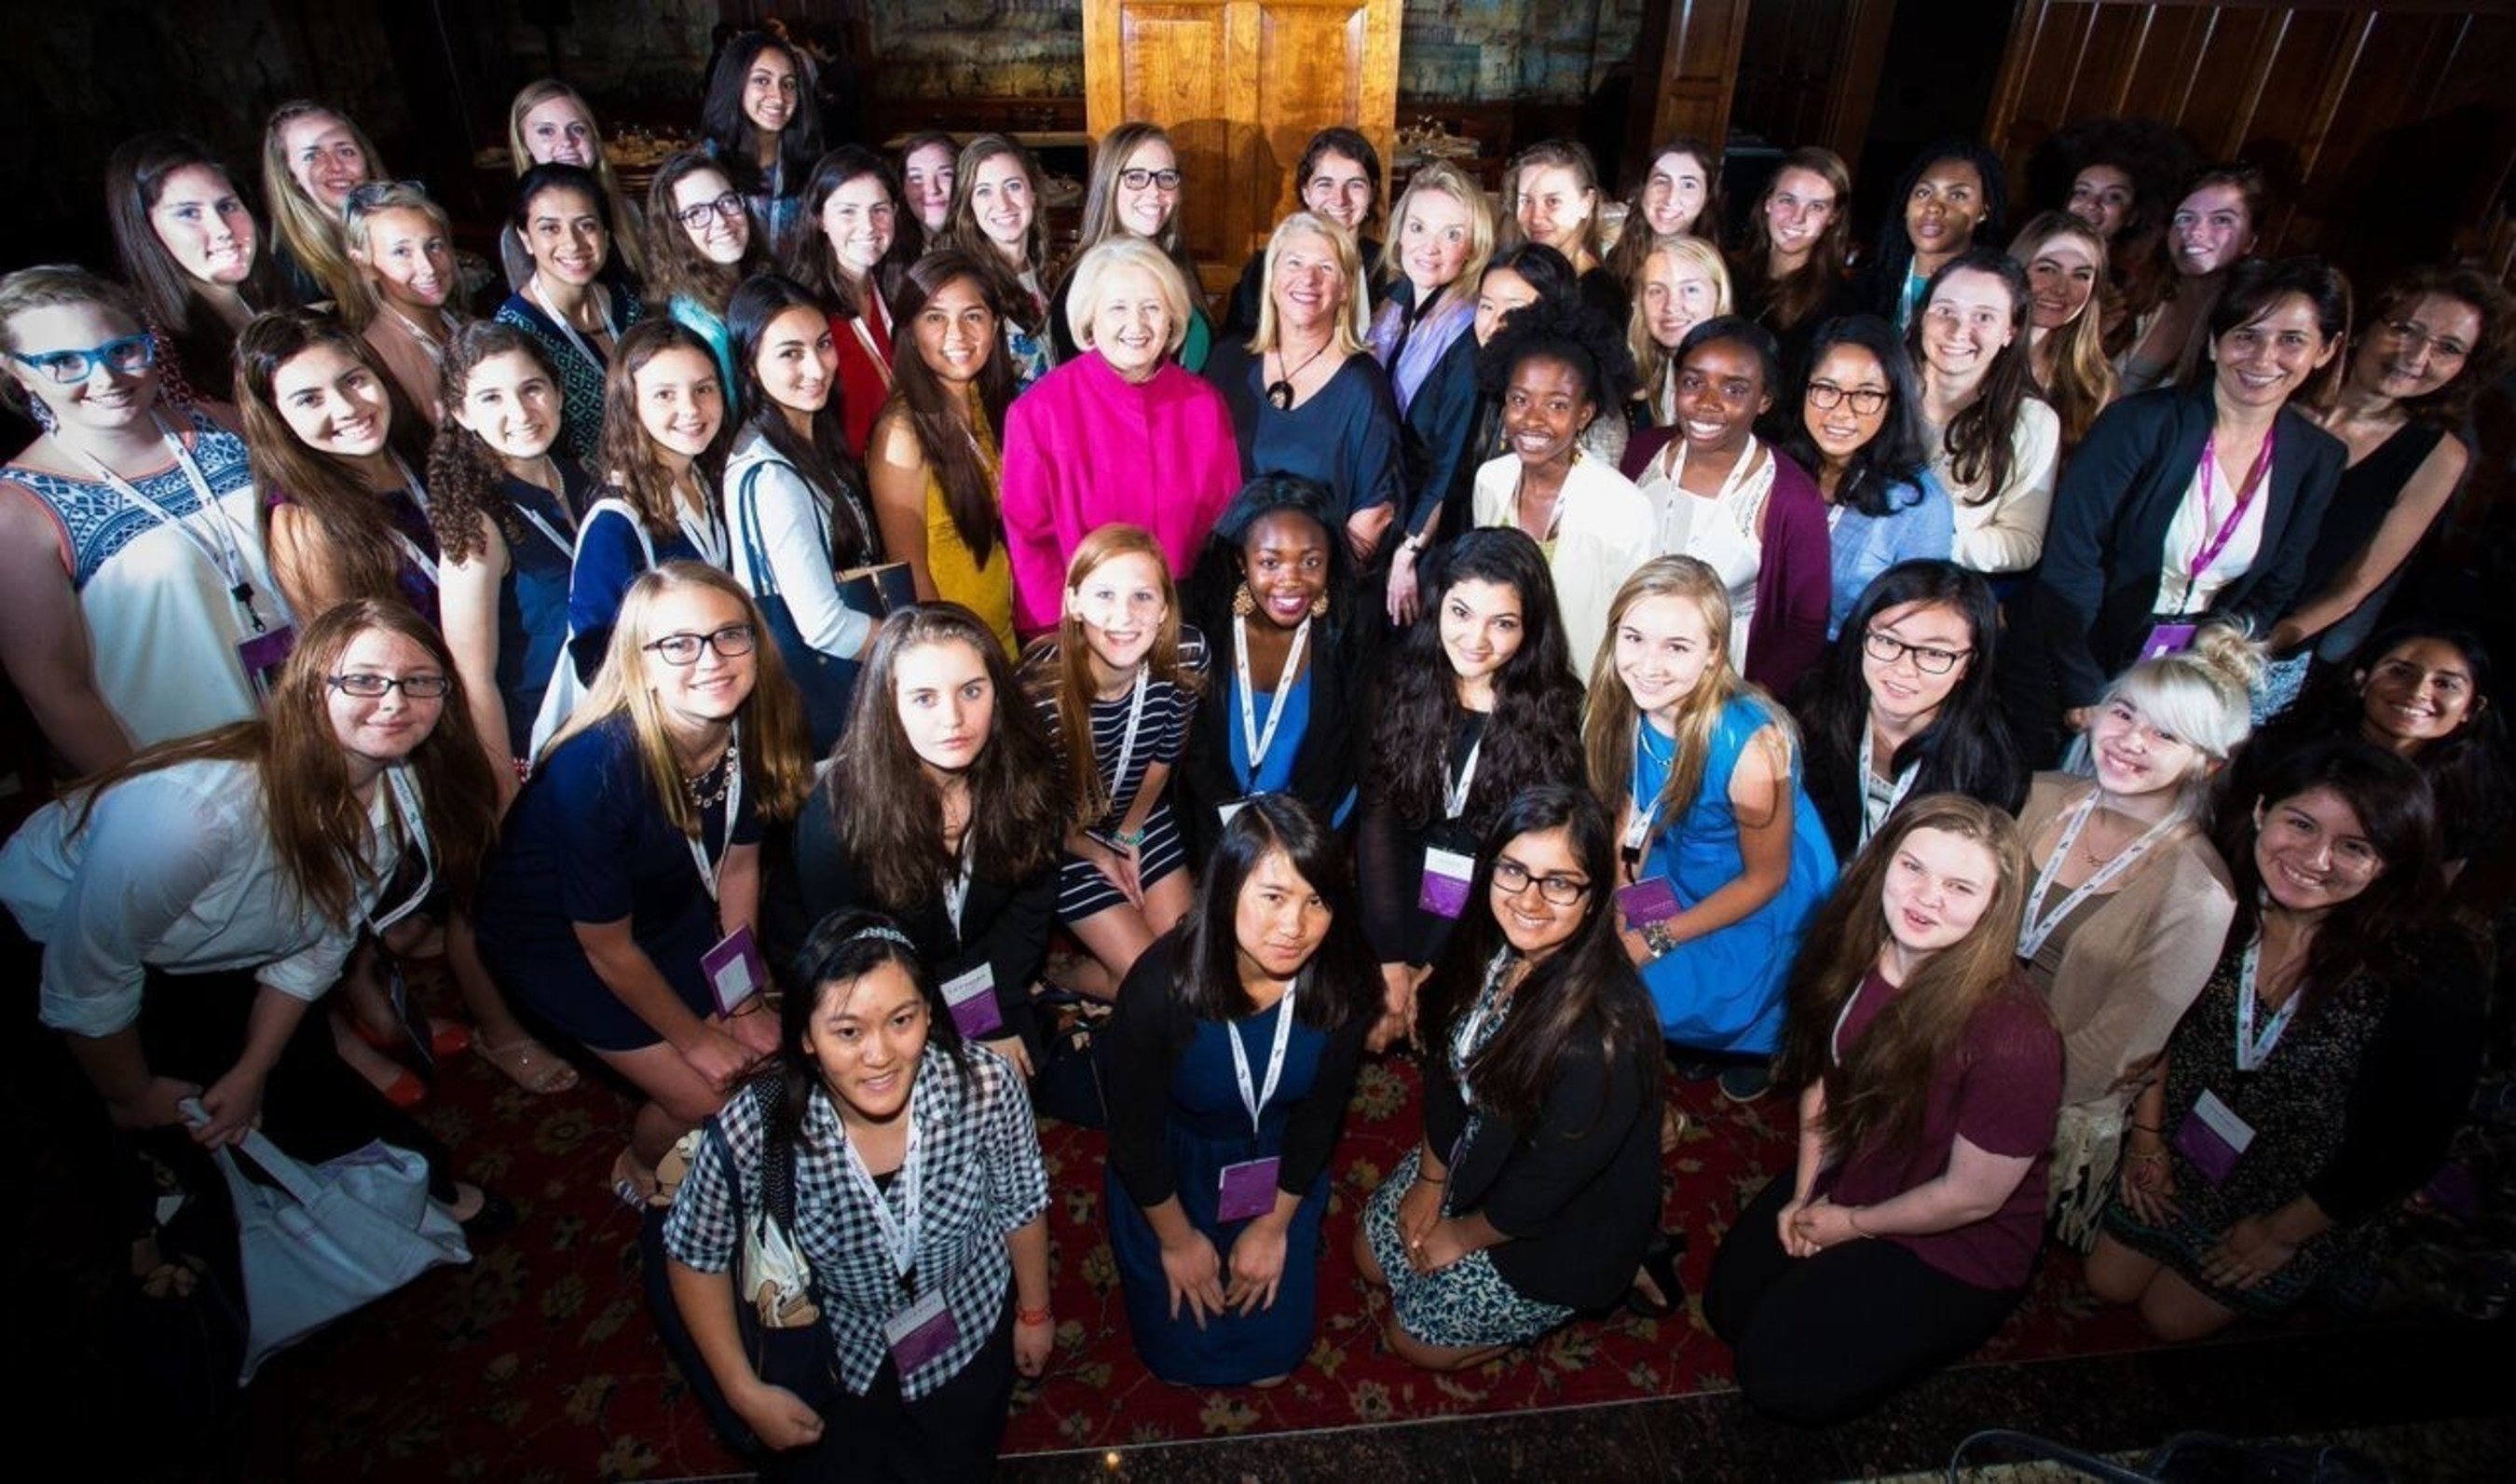 Ambassador Melanne Verveer, Kay Krill and Alyse Nelson mentor 50 Fellows at the 4th annual ANNpower Leadership Forum in Washington, D.C.